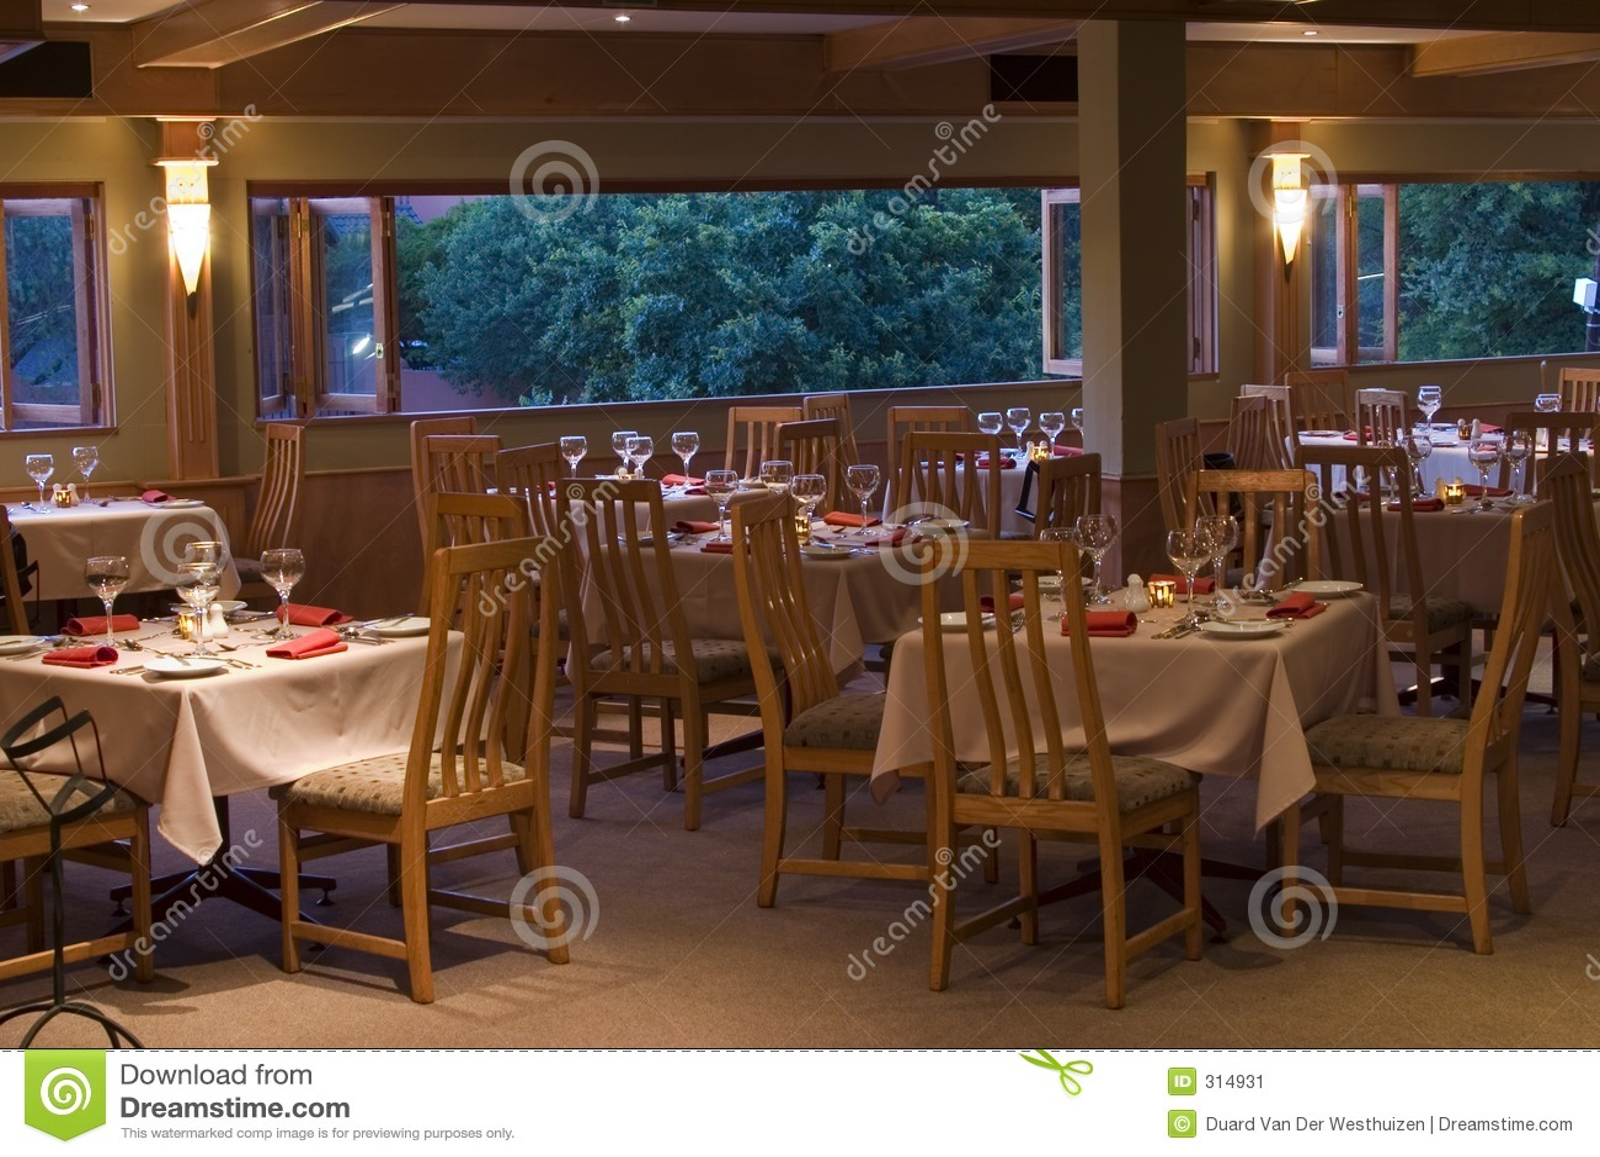 Restaurant tables - Restaurant Tables